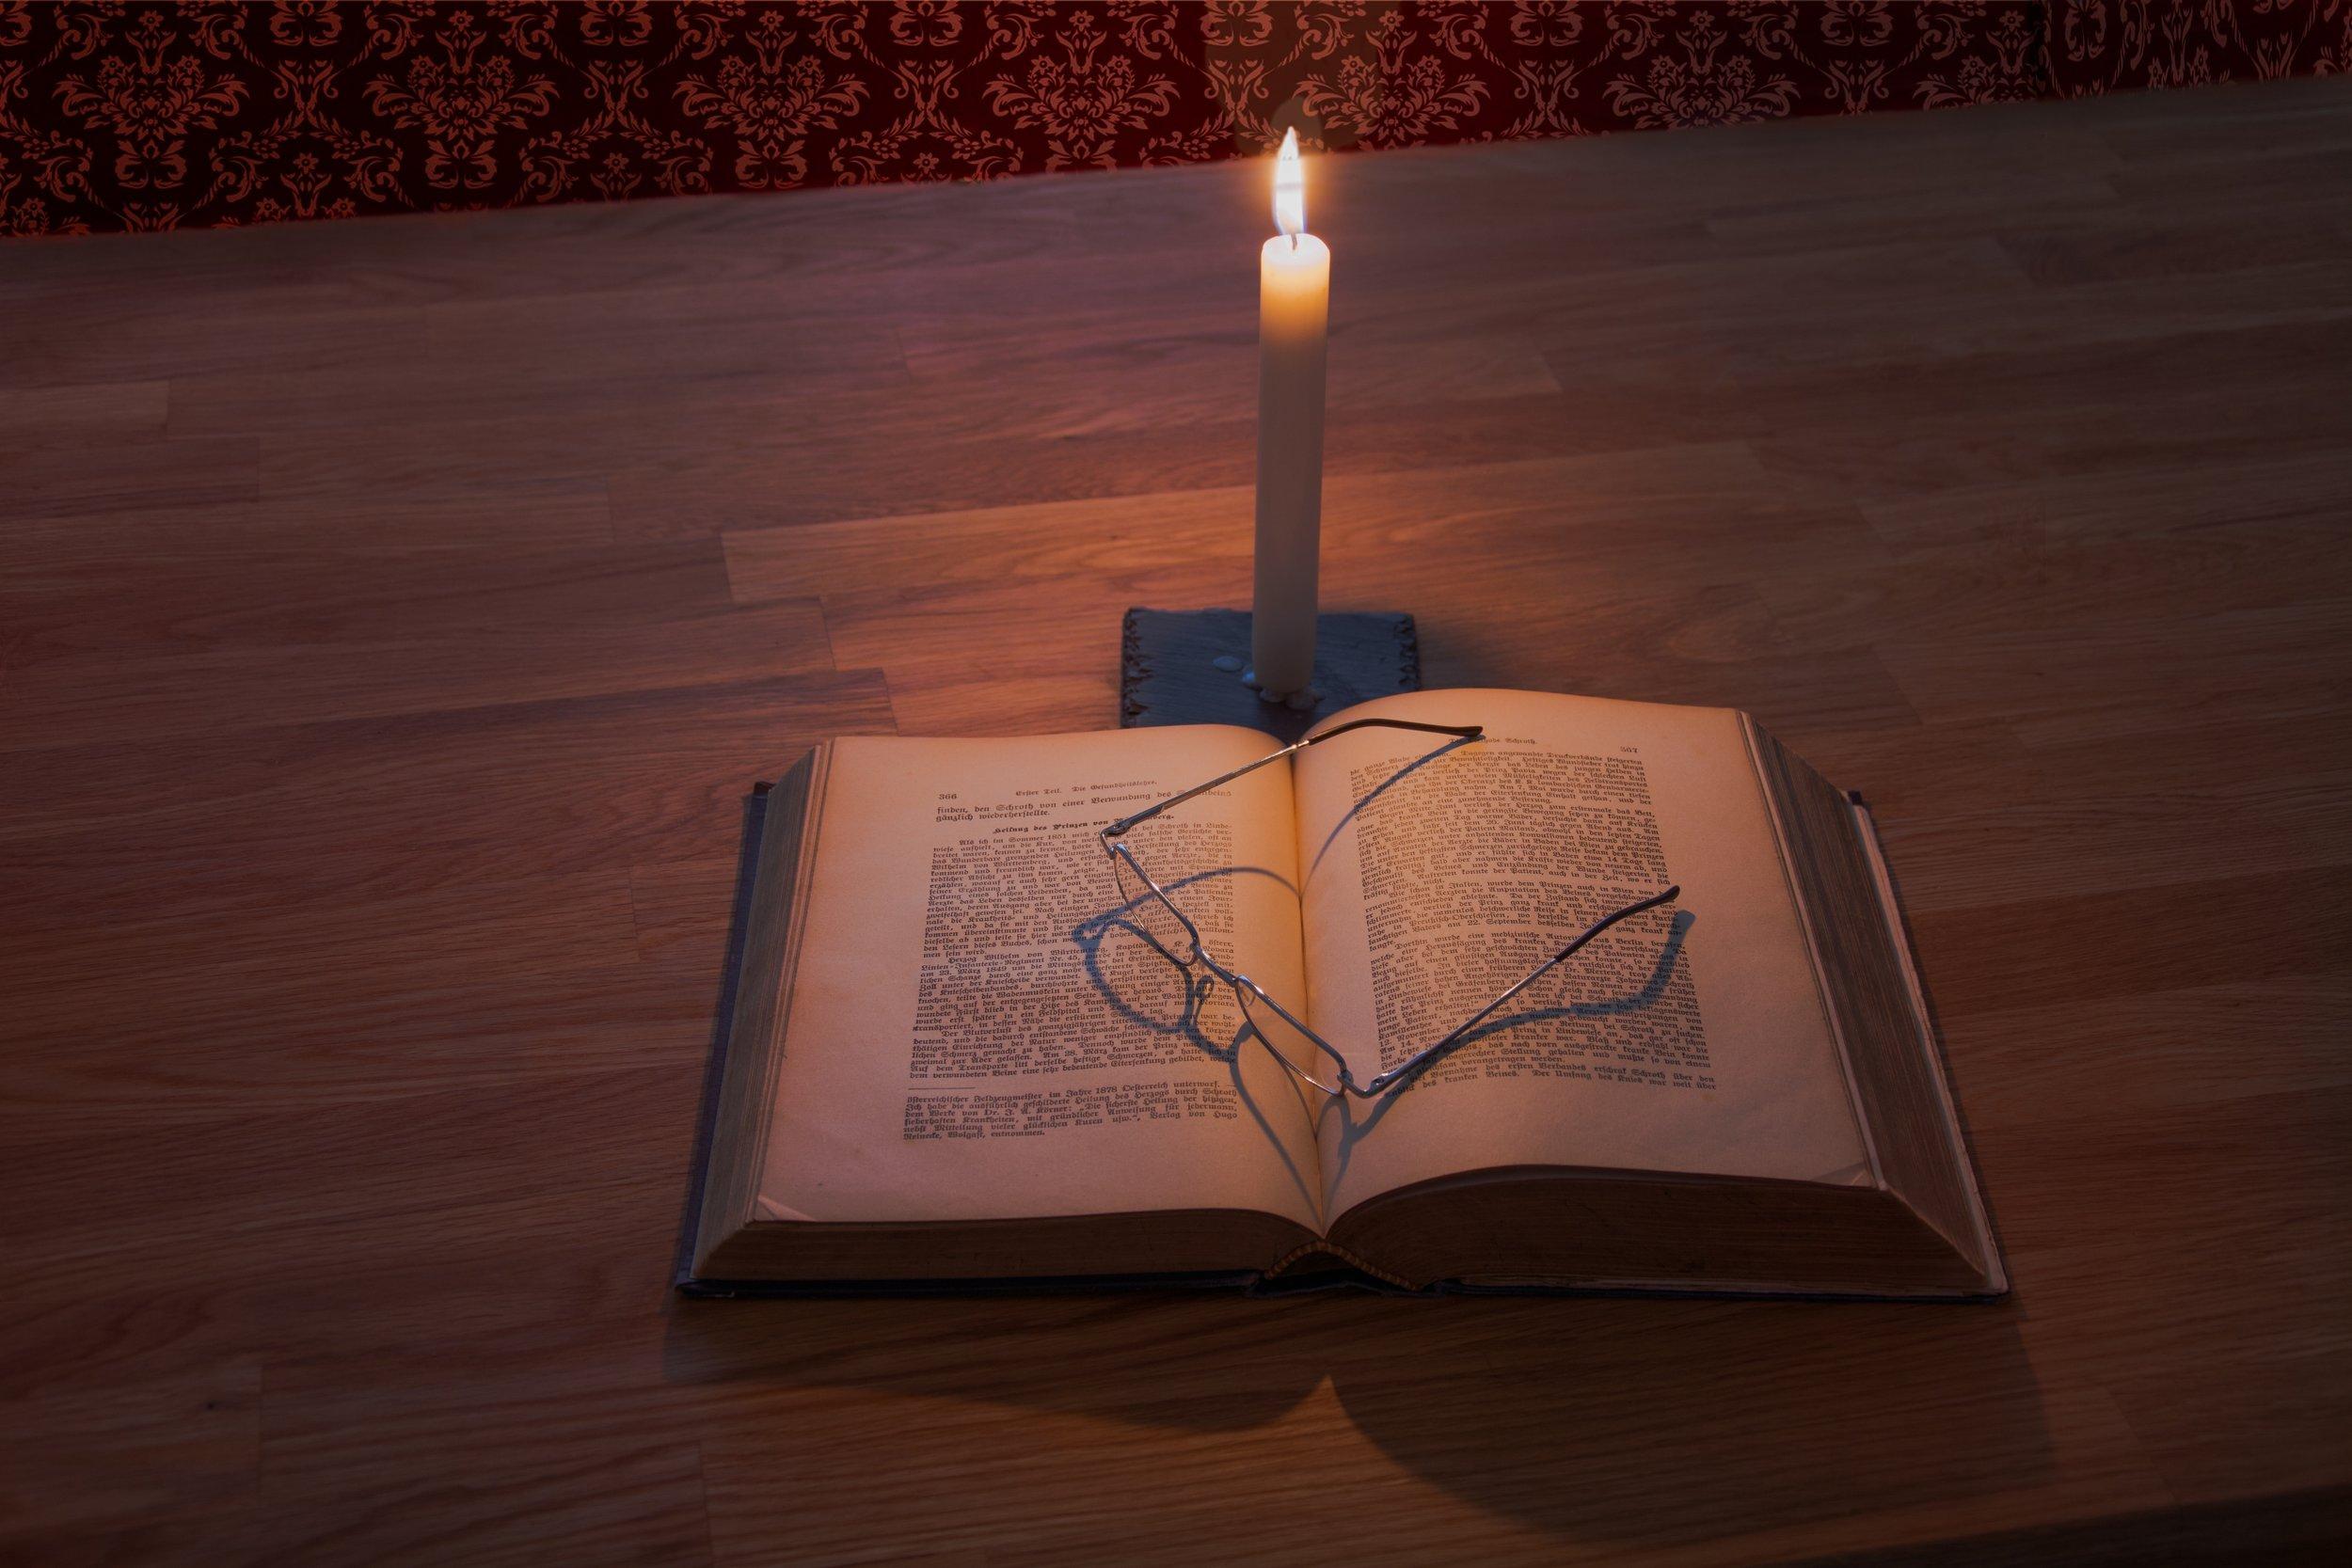 bible-book-candle-256560.jpg